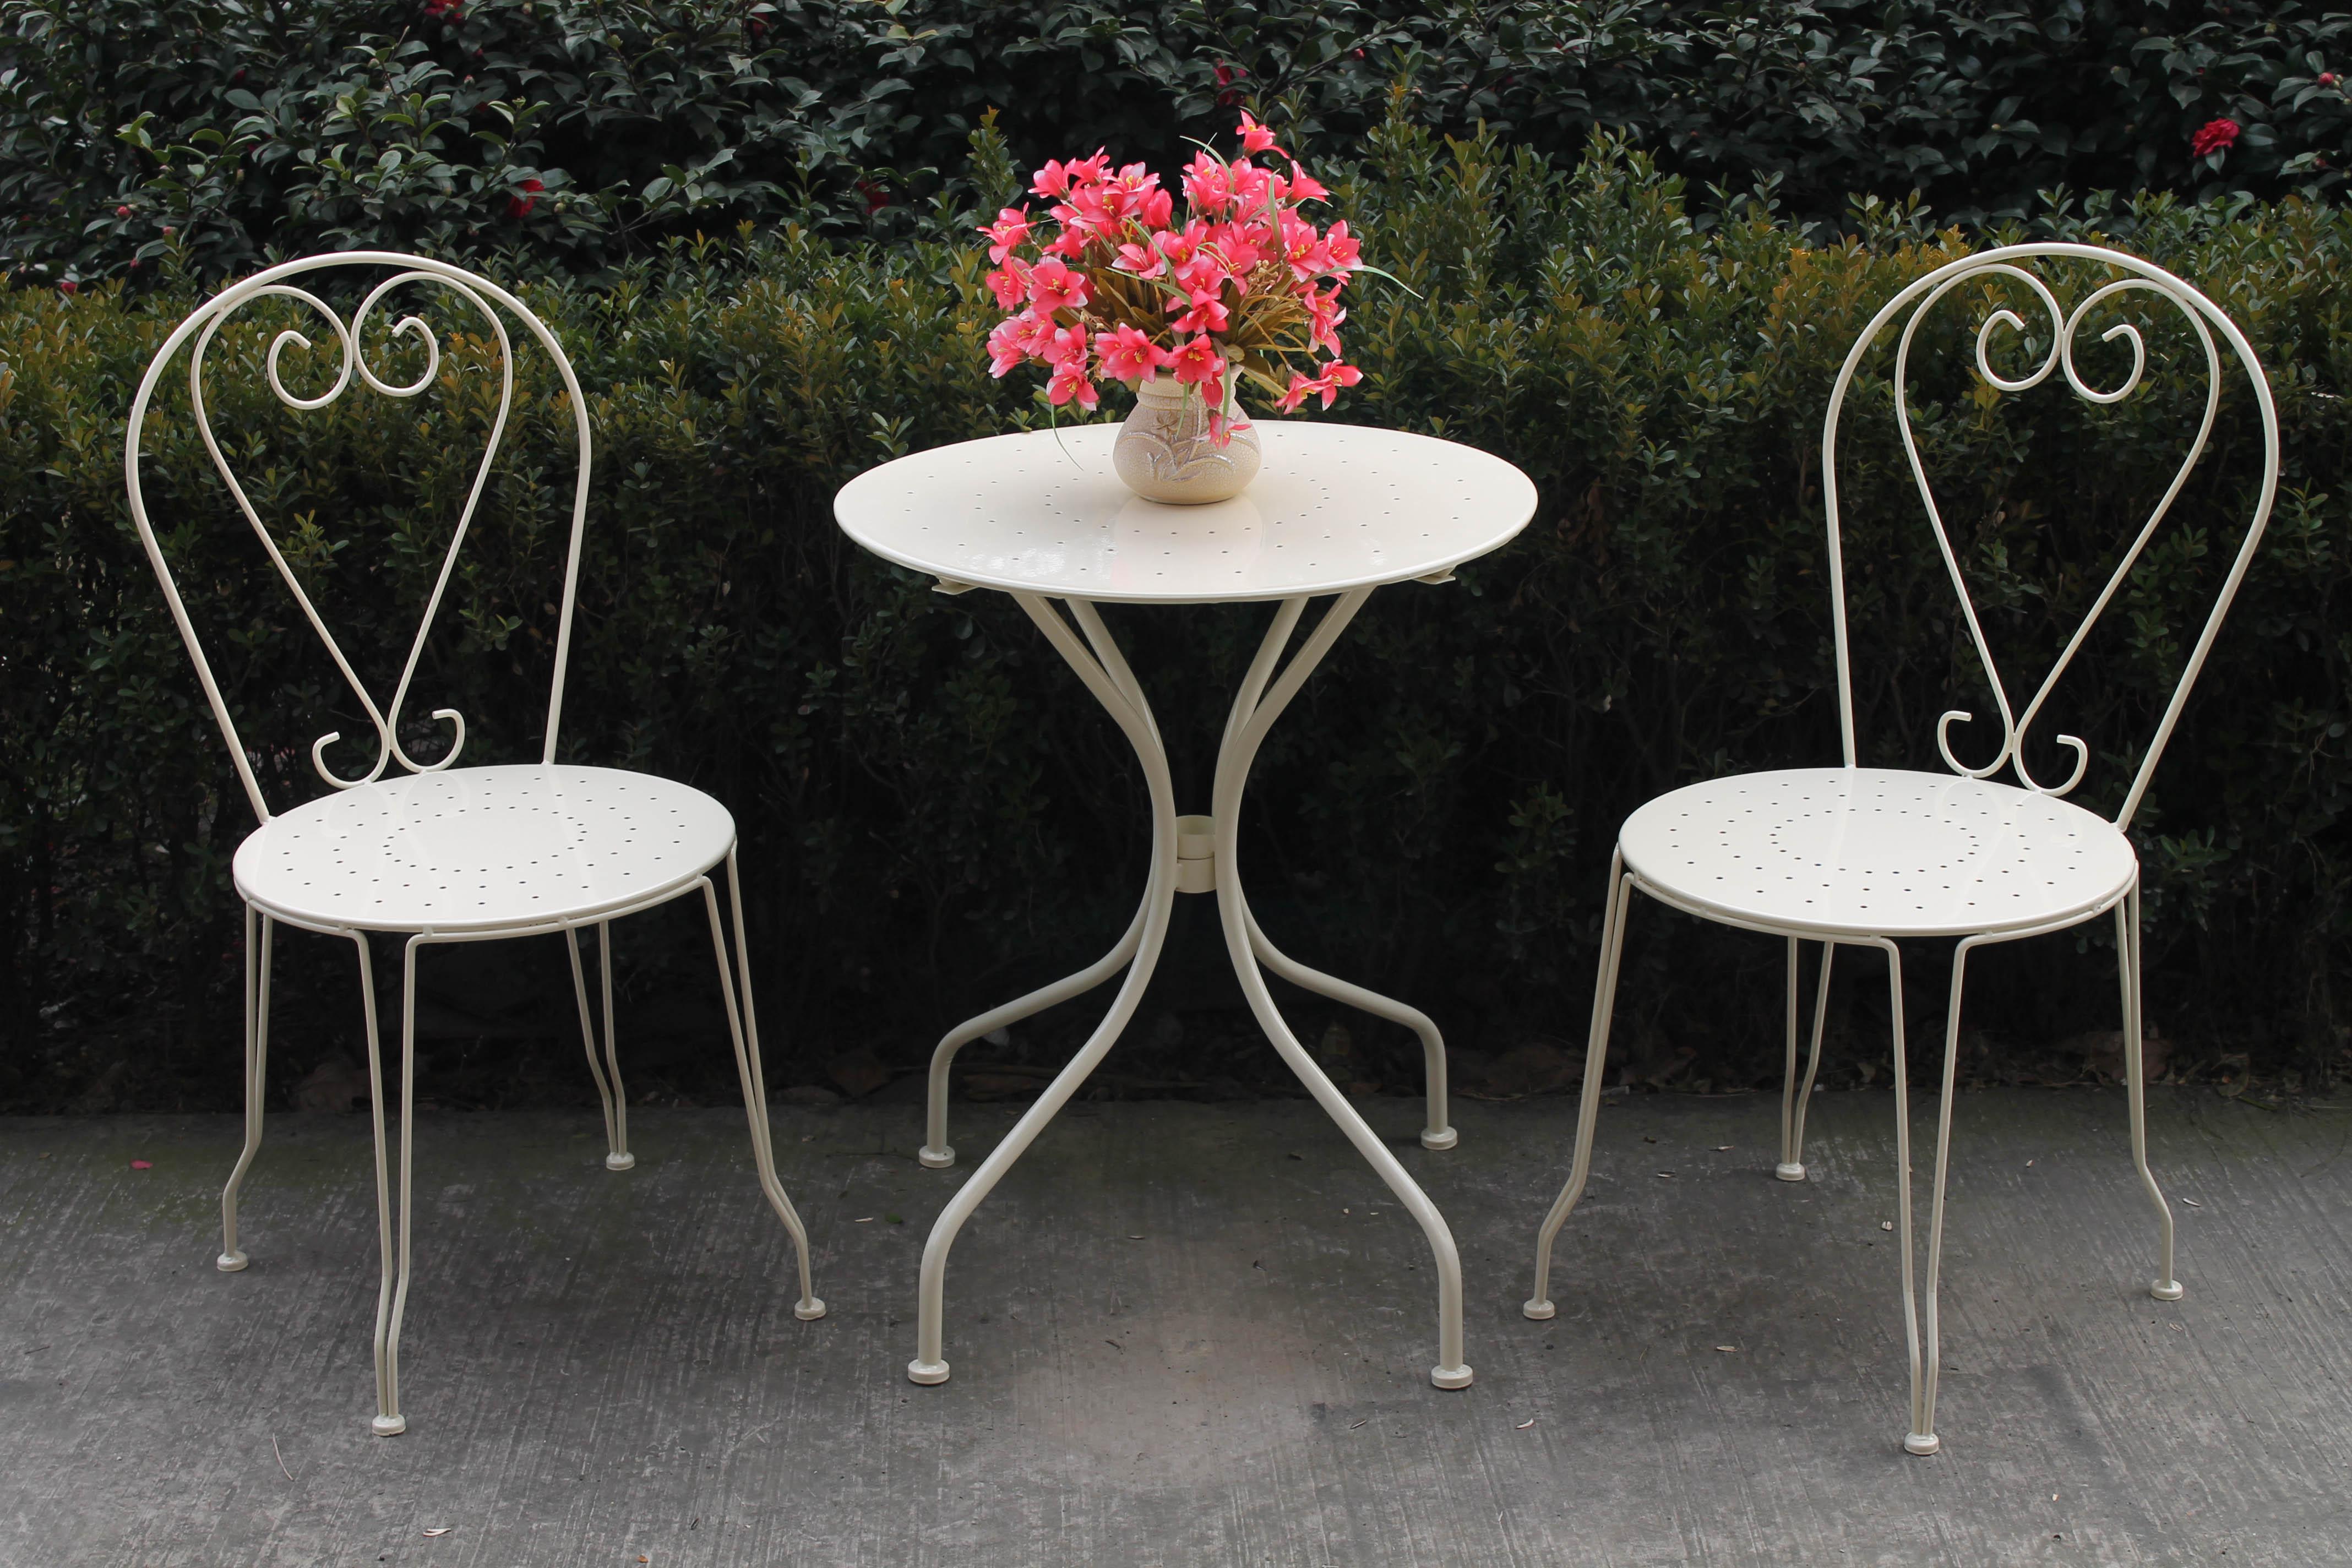 3 PIECE METAL GARDEN PATIO FURNITURE BISTRO SET ROUND TABLE. Cream Metal Garden Furniture   CotonGarden com